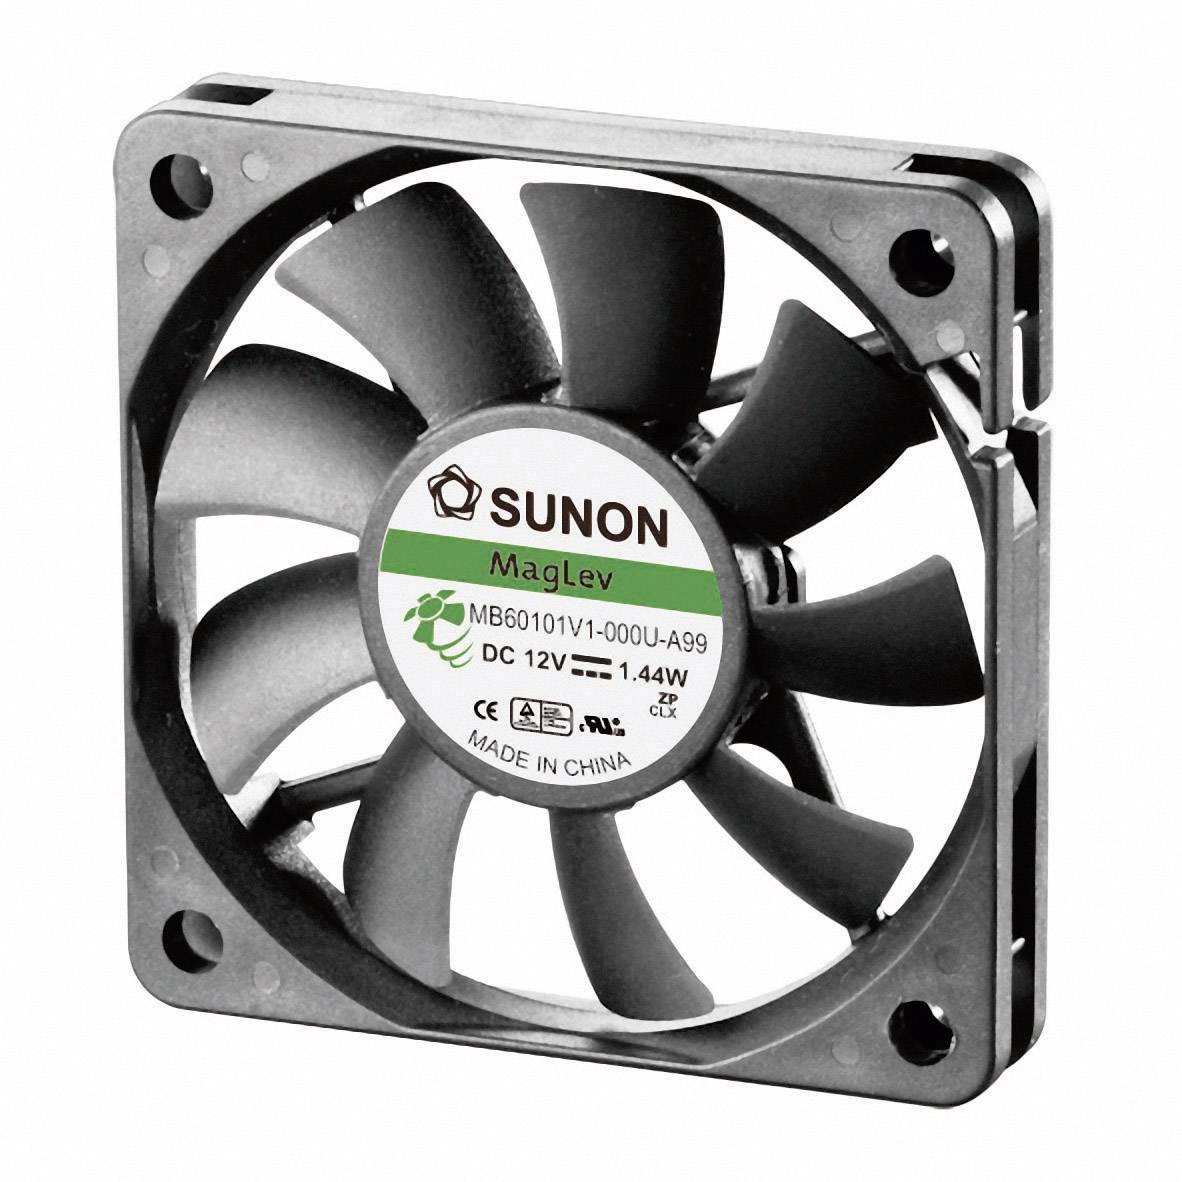 Axiálny ventilátor Sunon MB60101V1-0000-A99 MB60101V1-0000-A99, 12 V/DC, 28.5 dB, (d x š x v) 60 x 60 x 10 mm